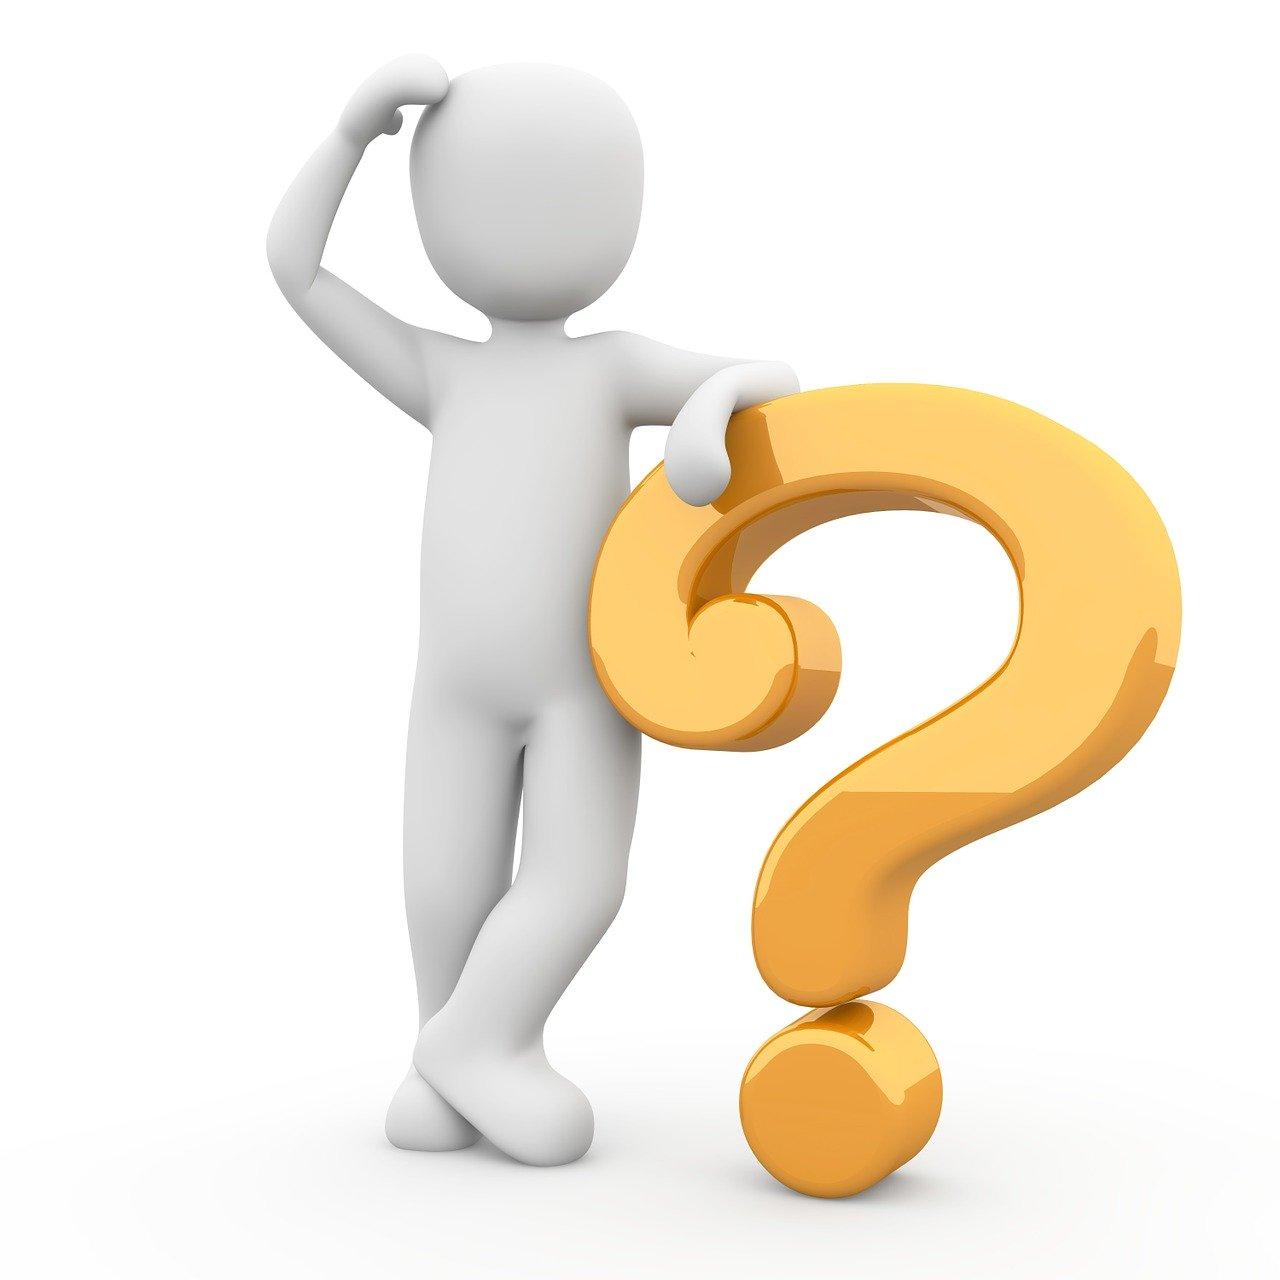 question mark, question, response